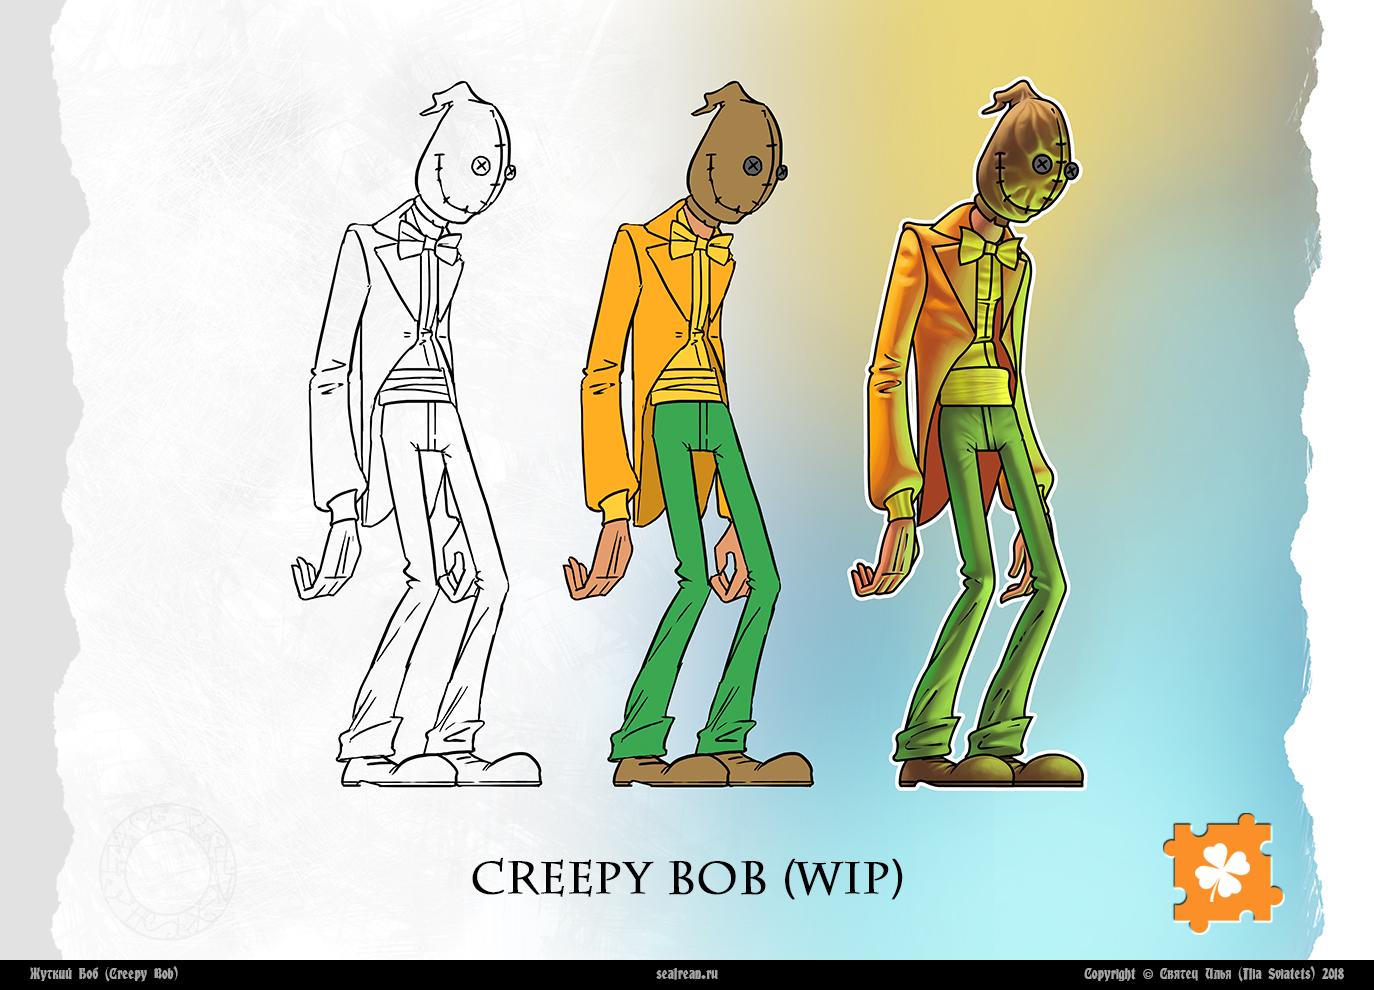 Creepy Bob (WIP)